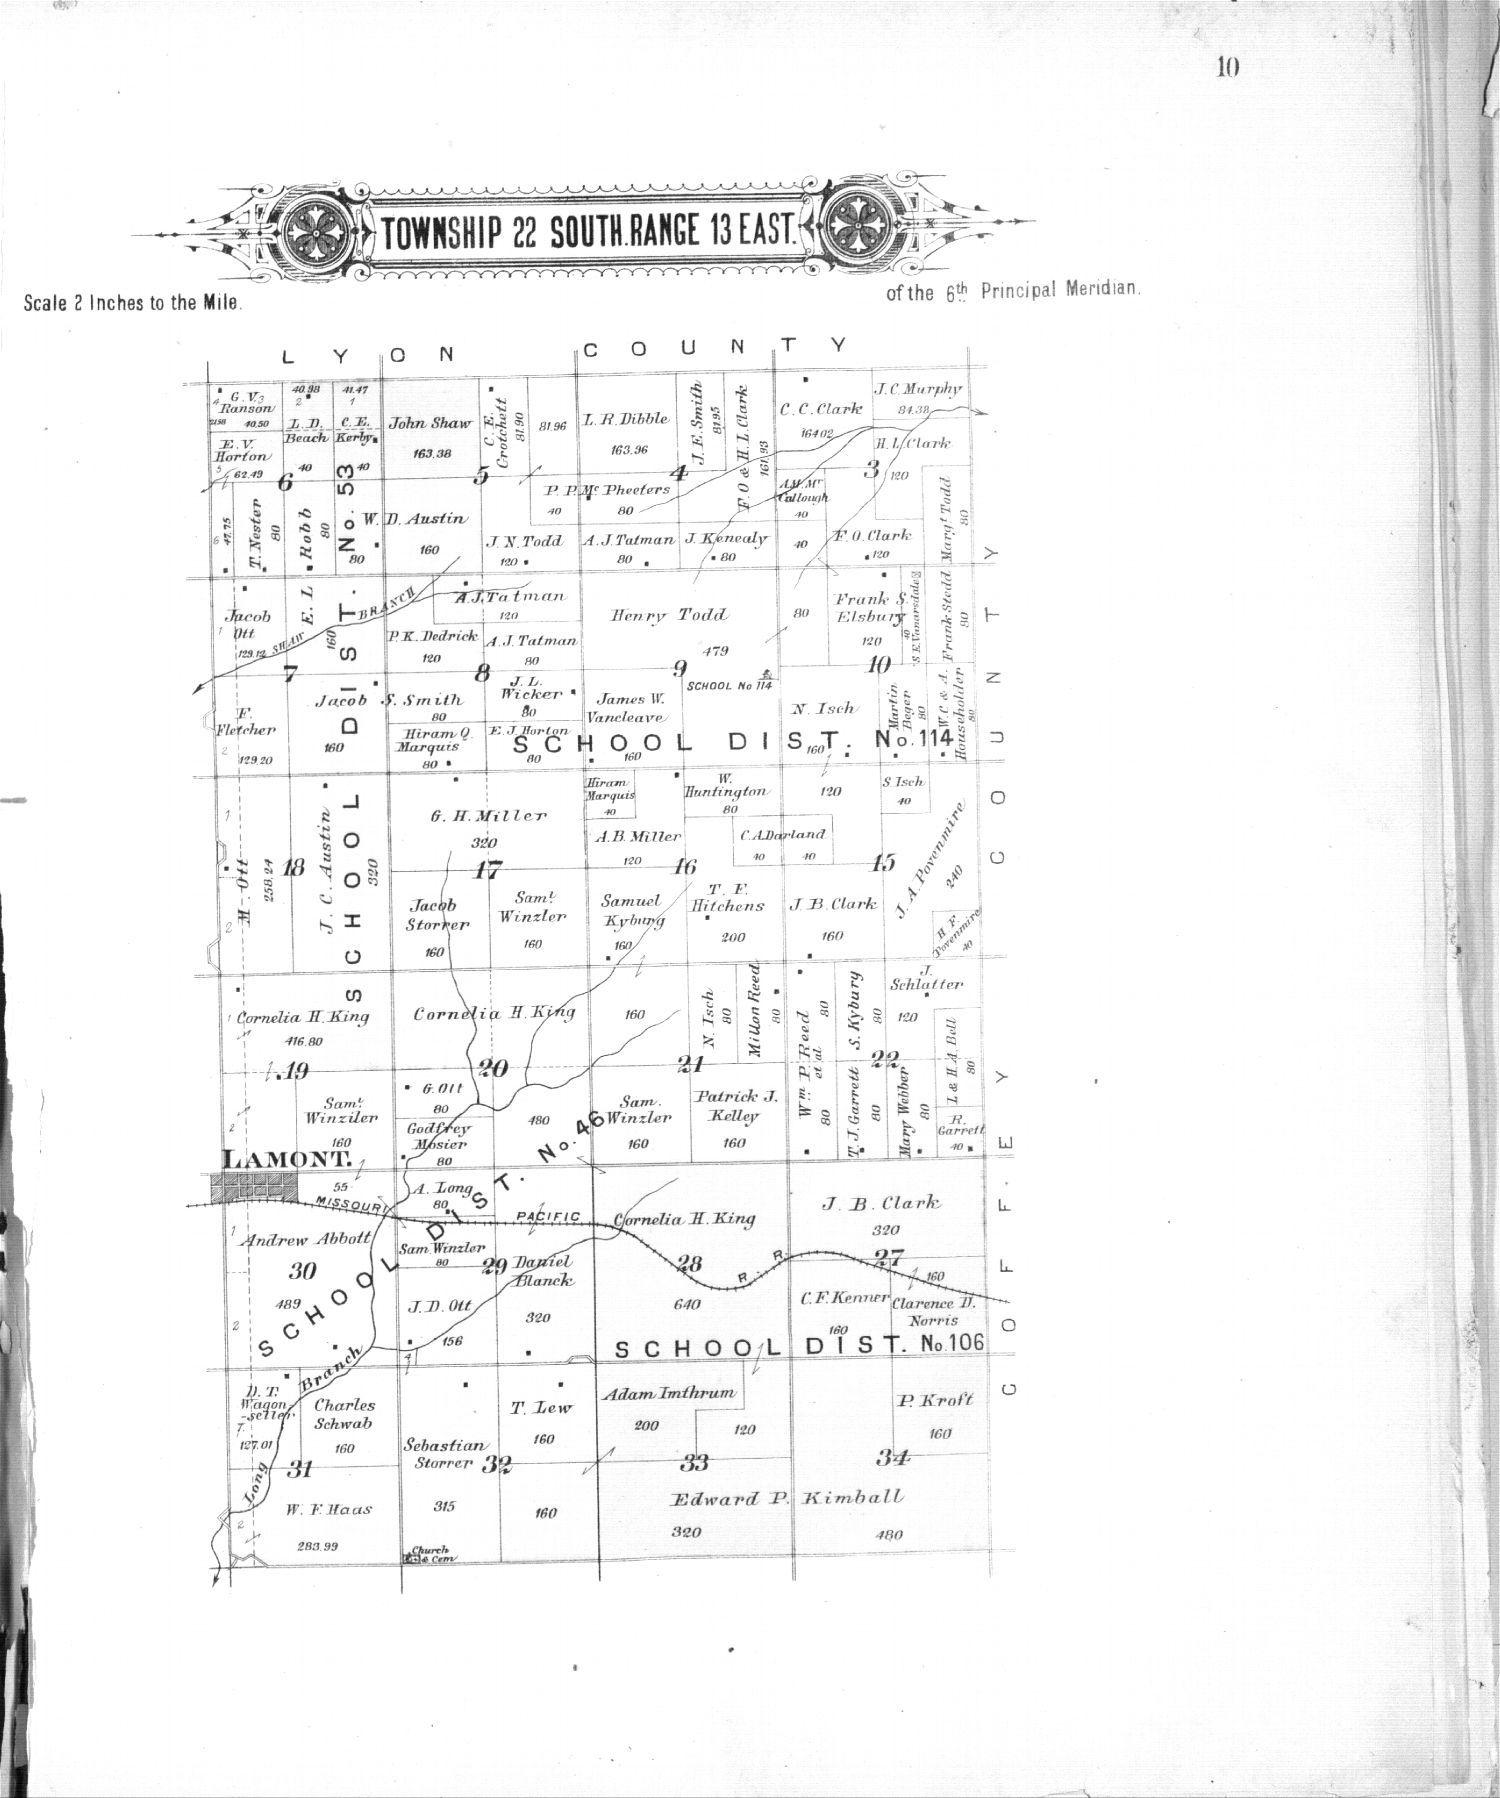 Plat book of Greenwood County, Kansas - 10